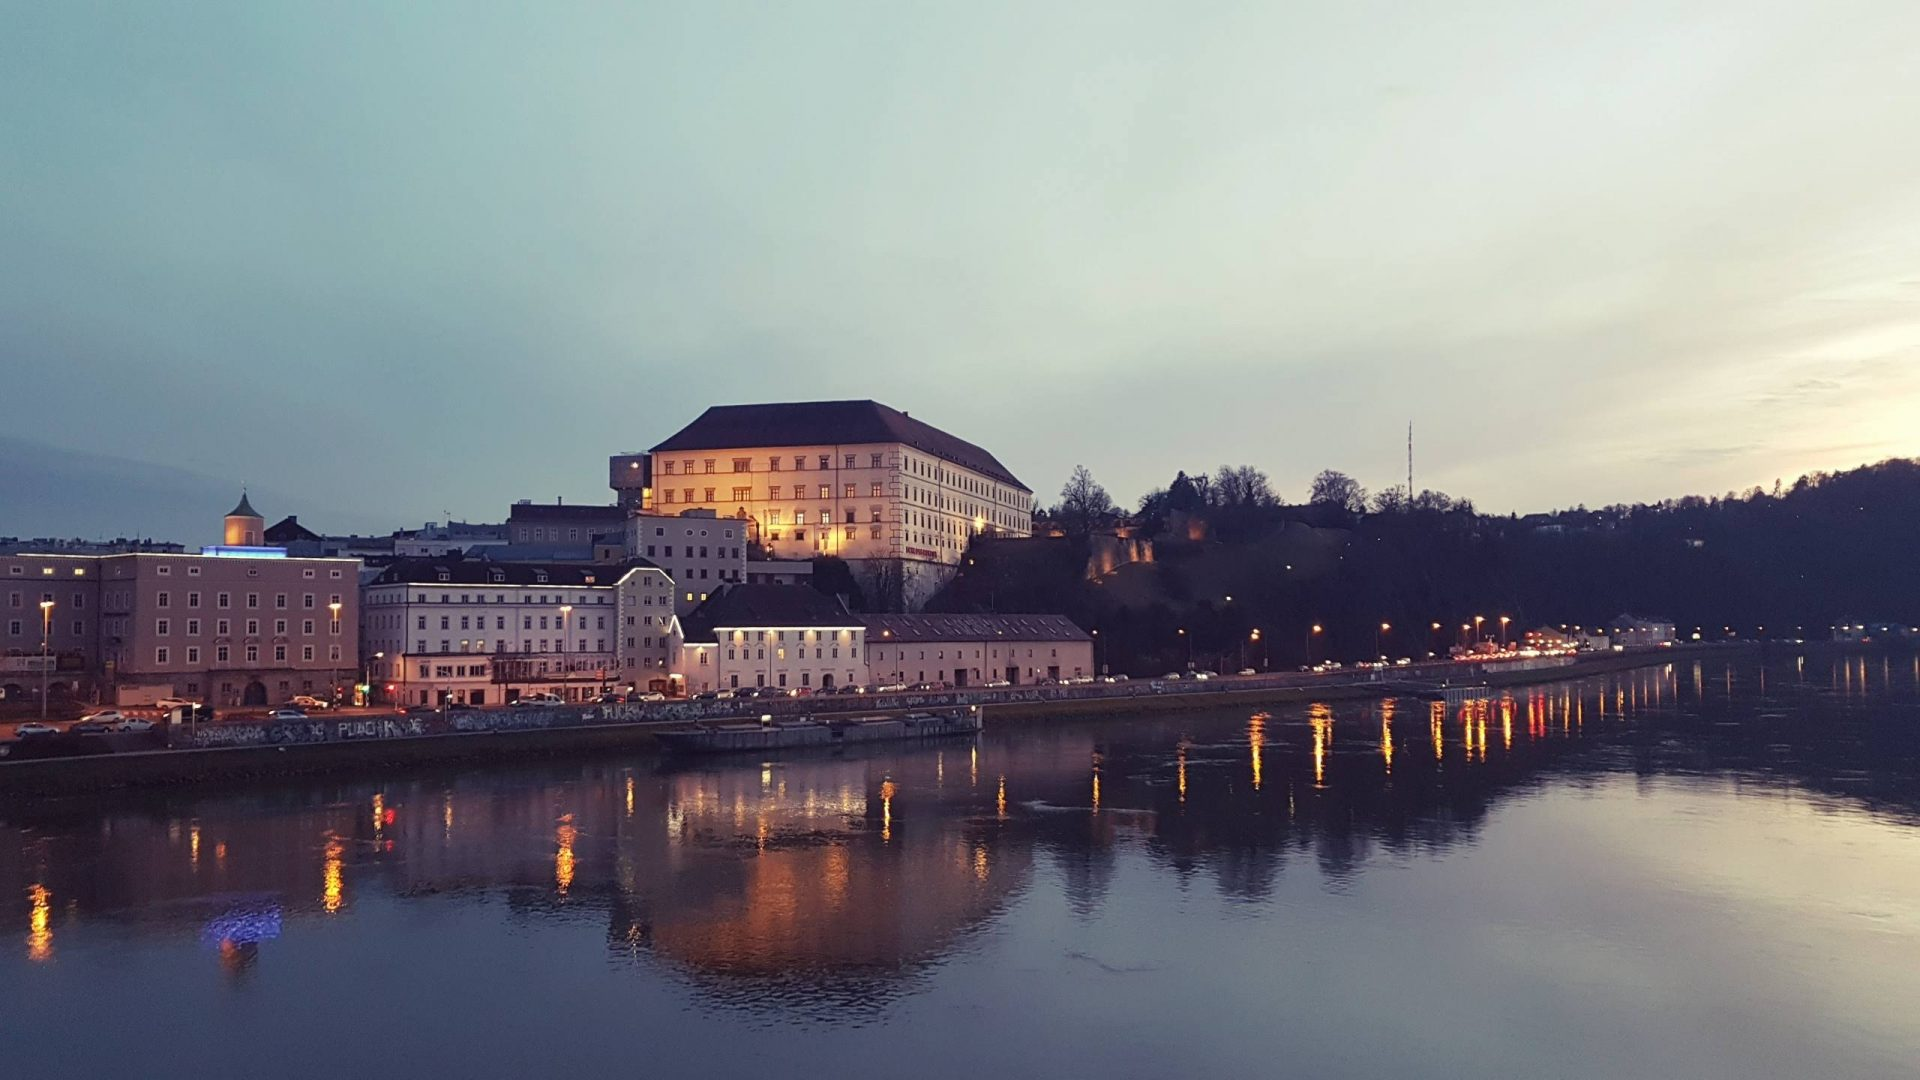 Замок Линца (Linzer Schloss) в Австрии.